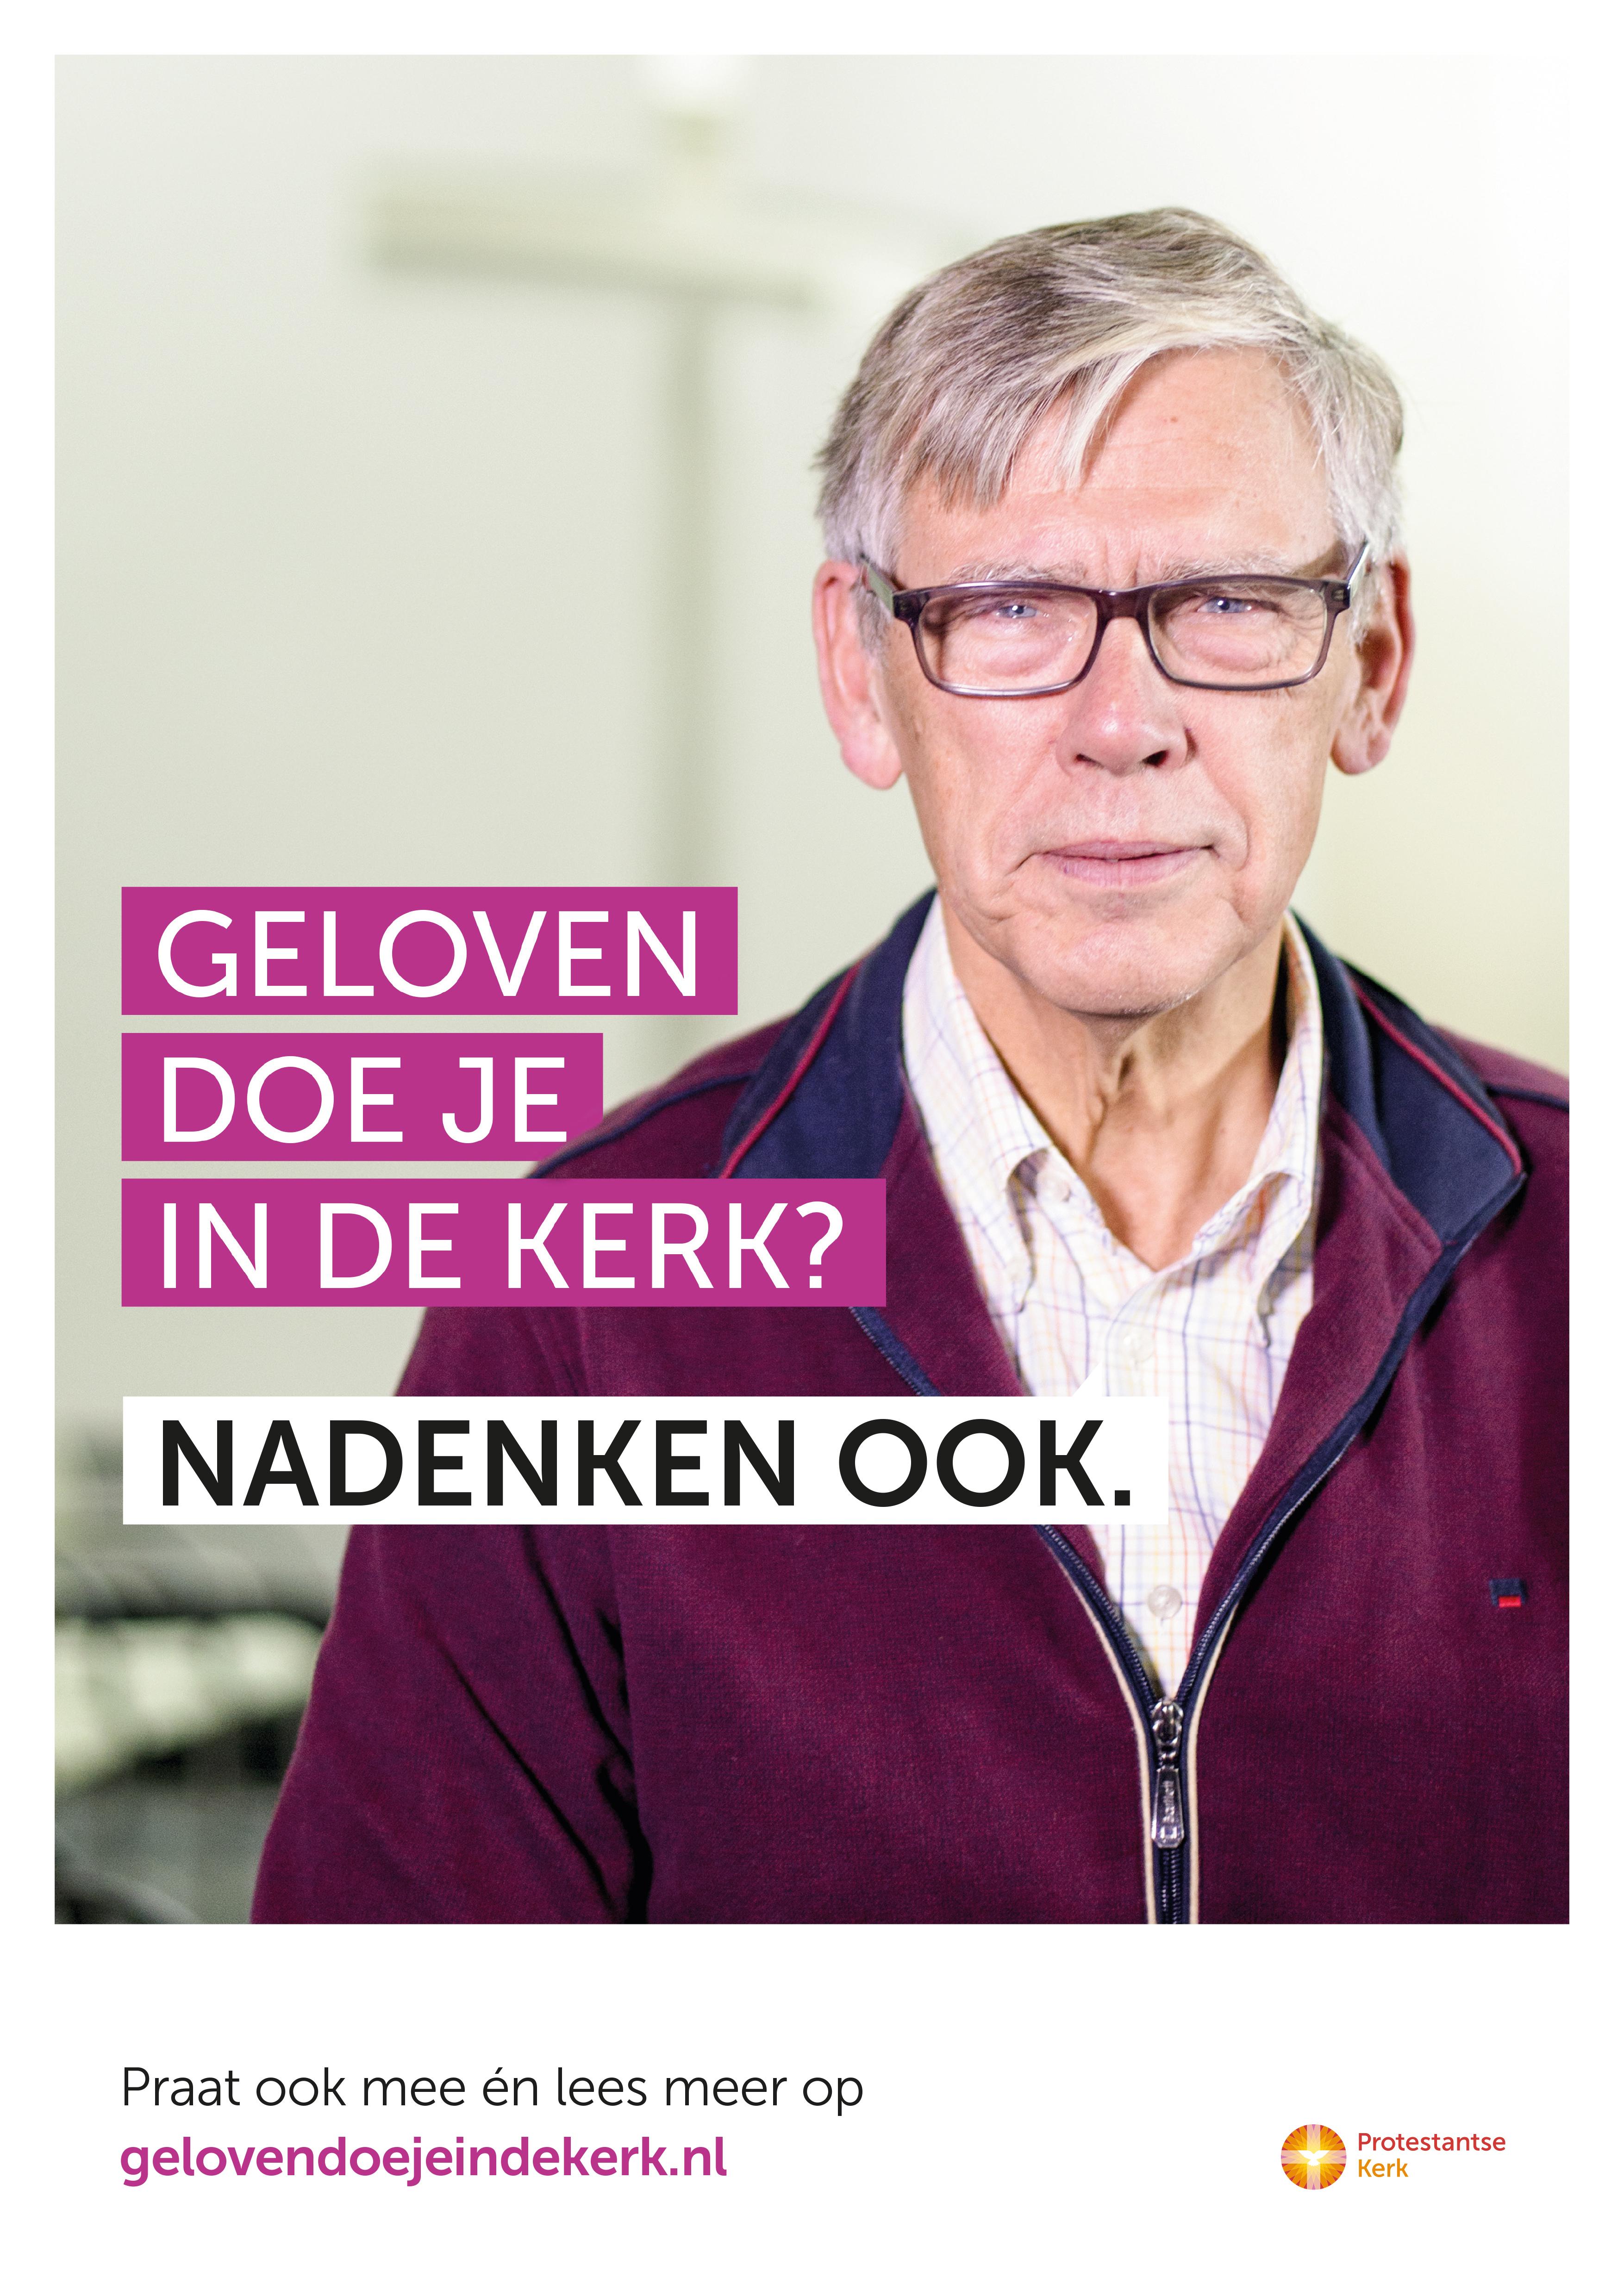 http://pkn-gravenpolder.nl/wp-content/uploads/2017/01/Print_Luc.jpg